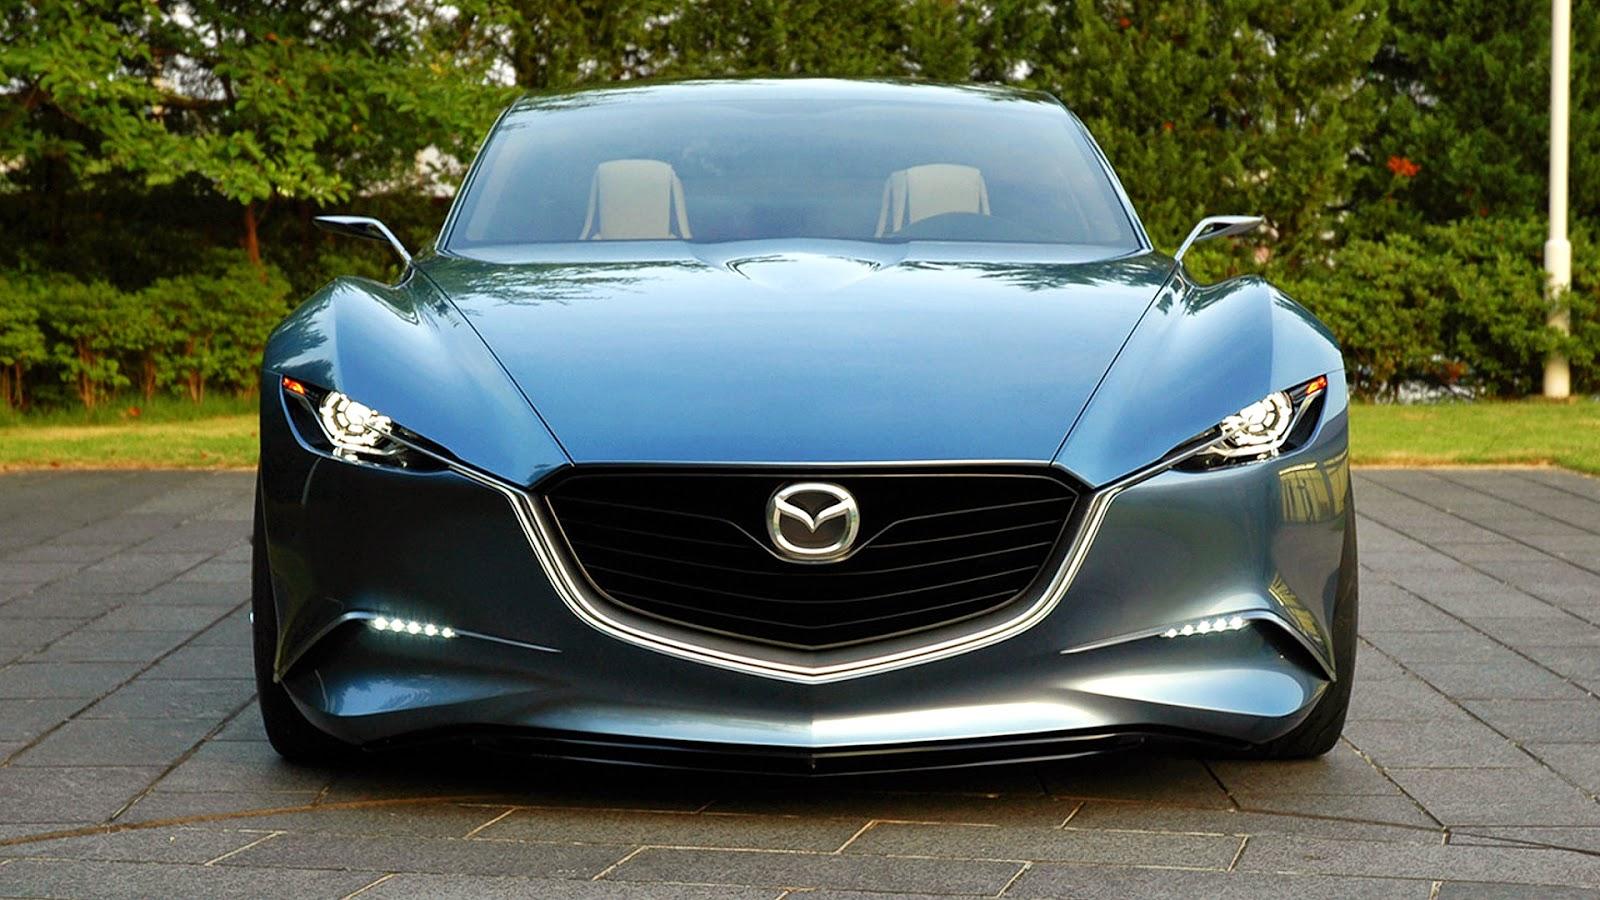 Mazda shinari on hd wallpaper hd wallpaper with cars - Future cars hd wallpapers ...